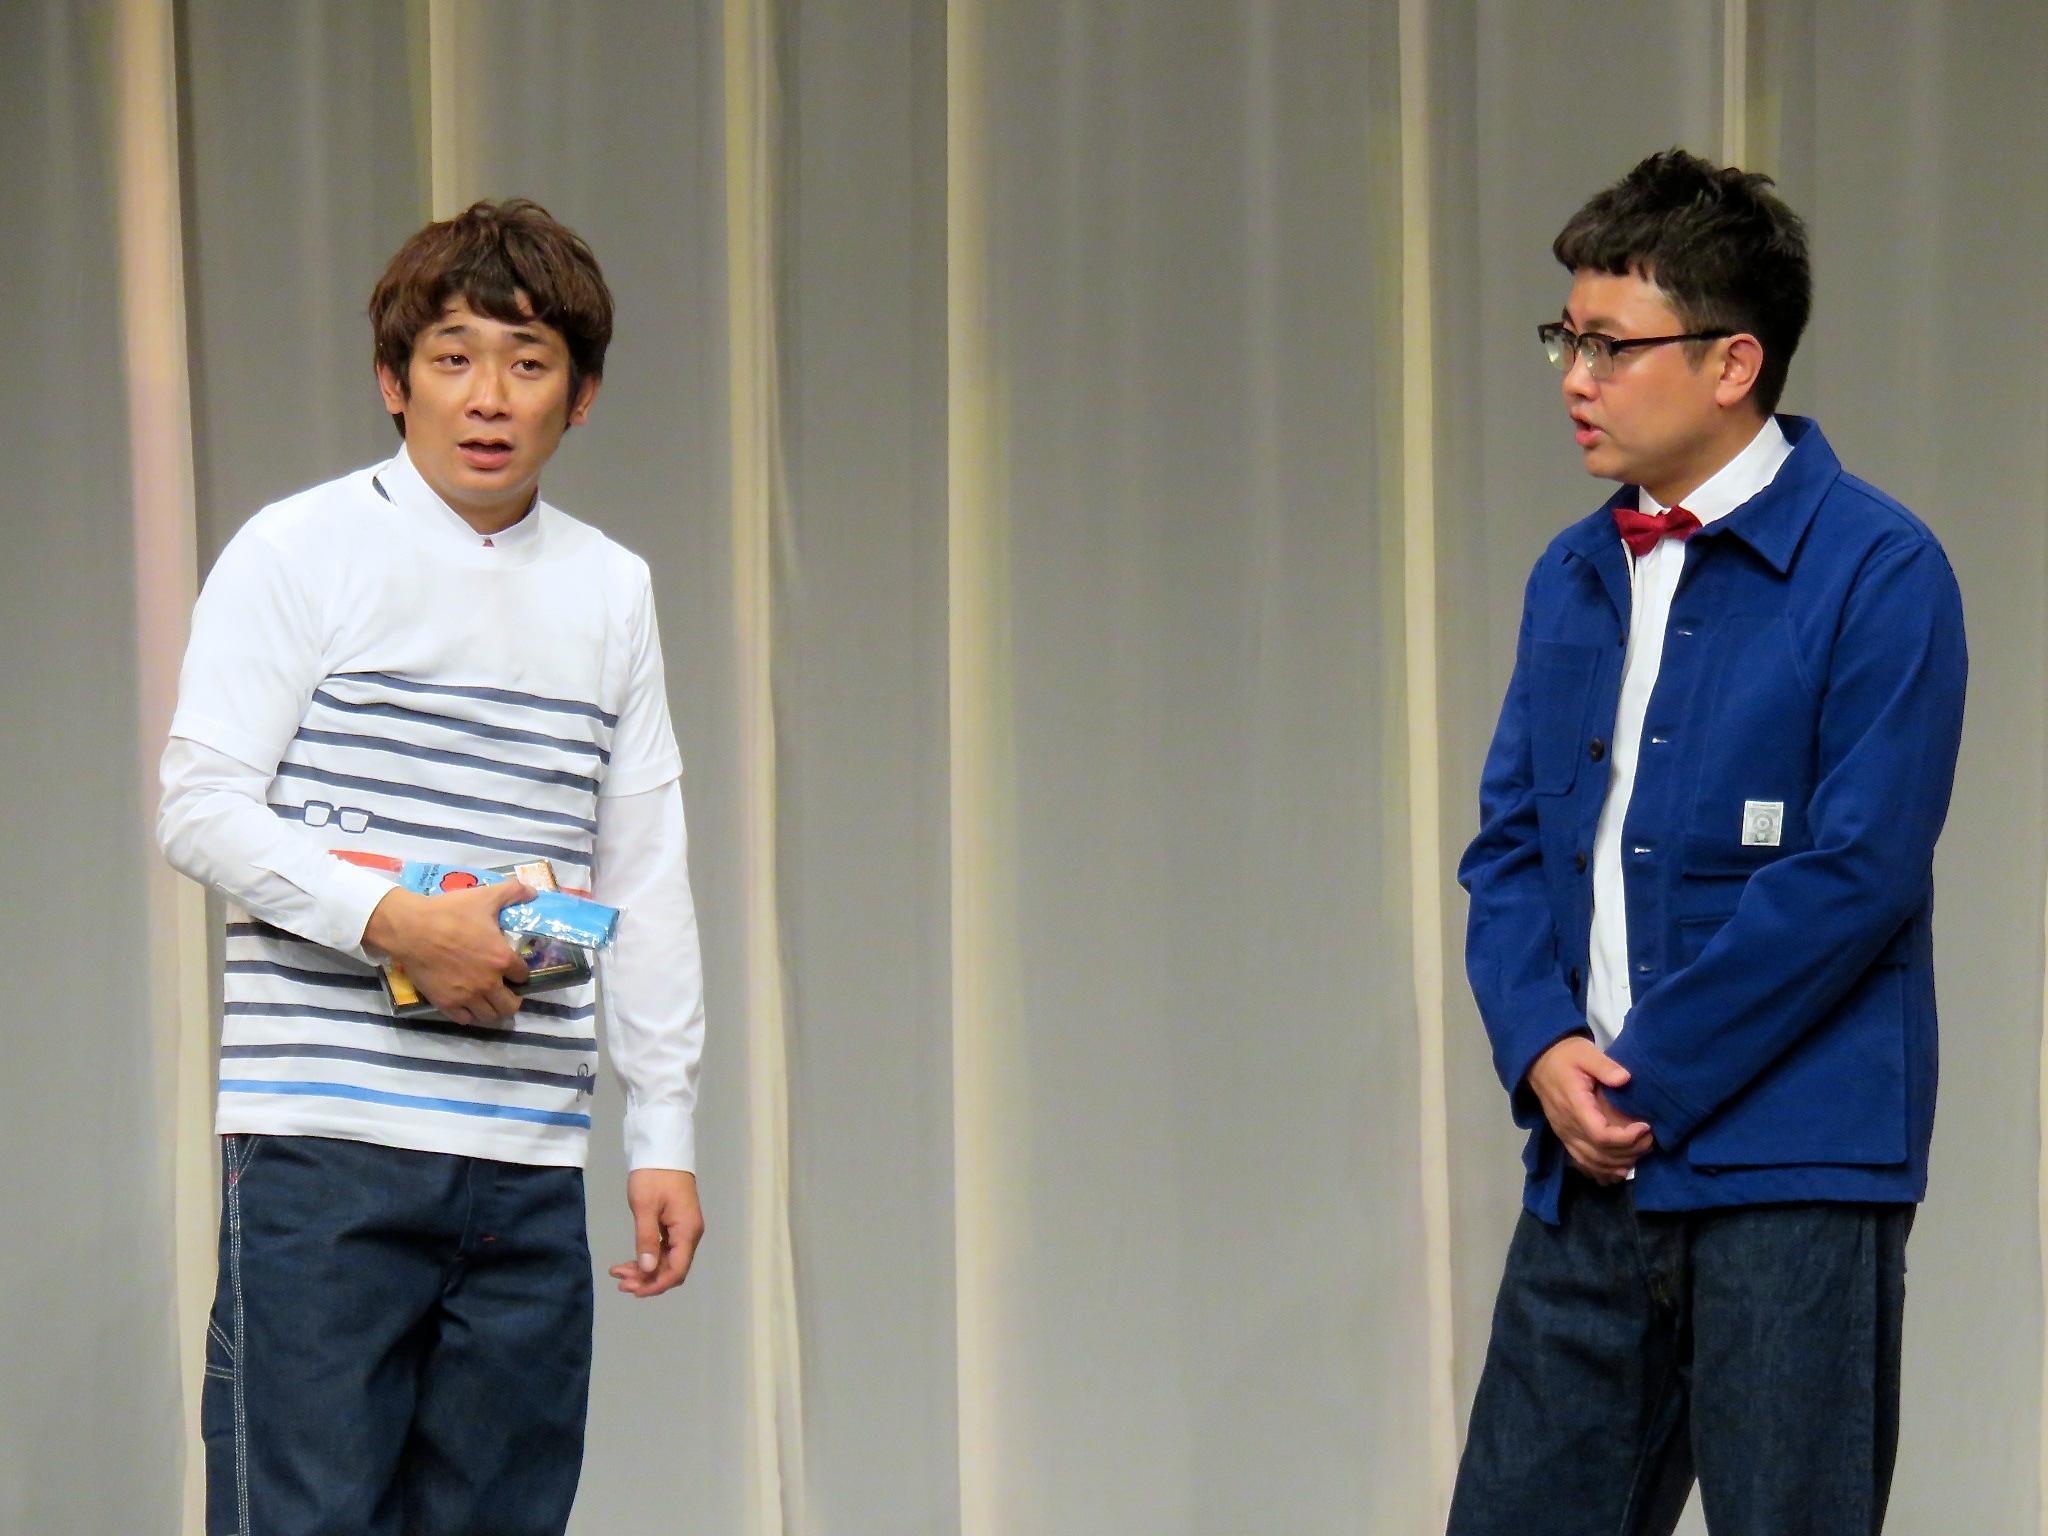 http://news.yoshimoto.co.jp/20171010203806-d6dbe8eceb35cefd02edbc86a4fd8fad4089d00c.jpg